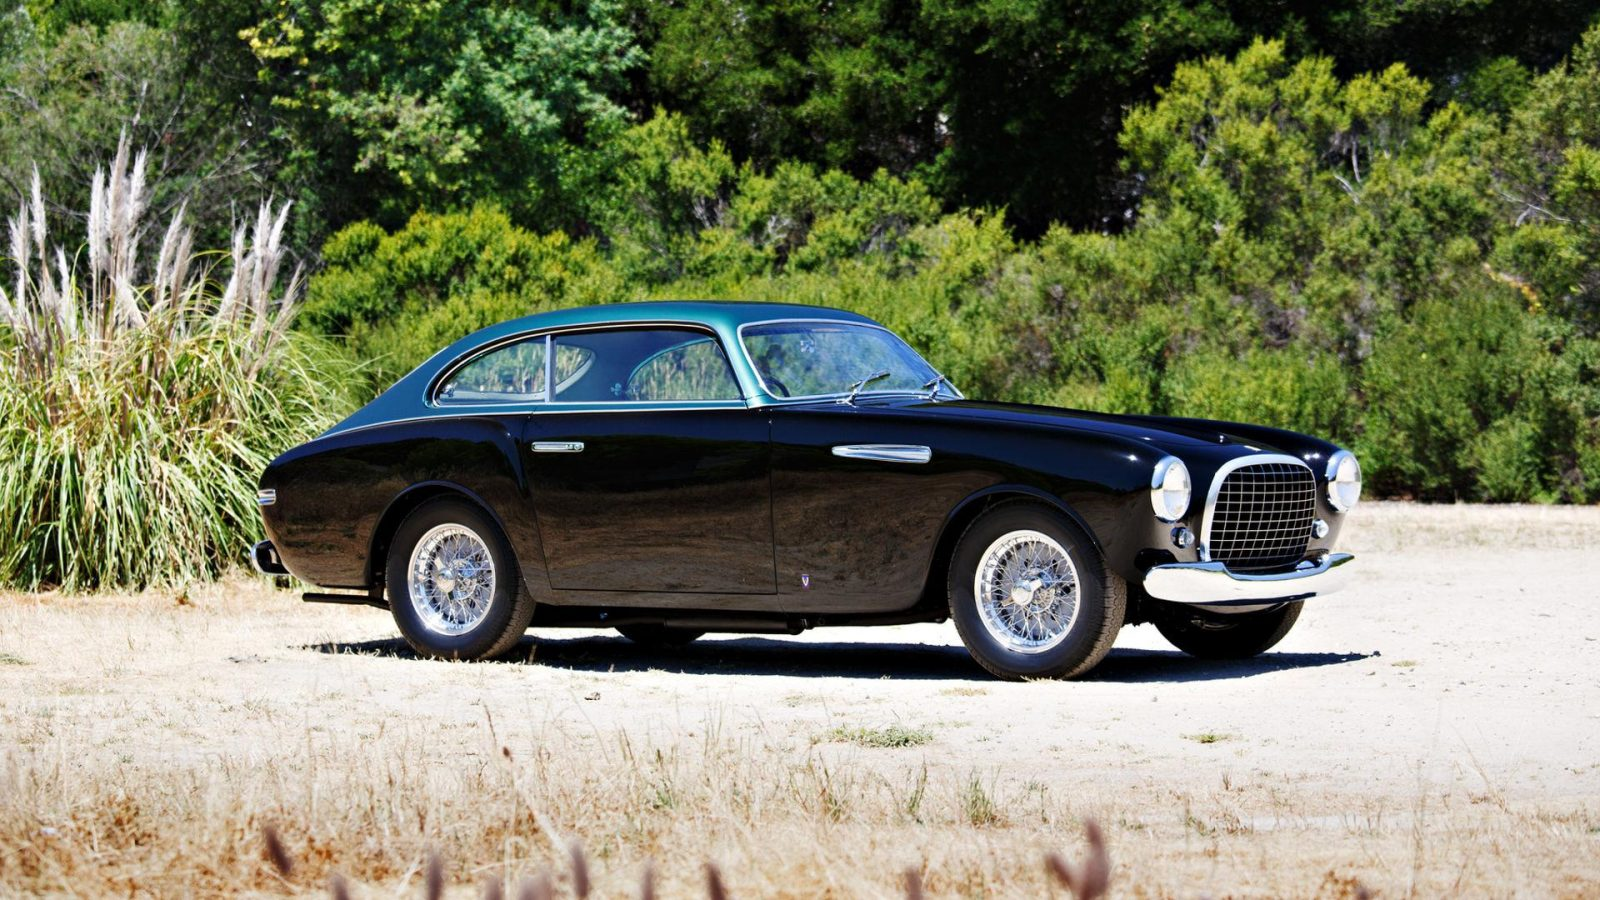 1951-ferrari-212-inter-coupe-copyright-gooding-company-brian-henniker